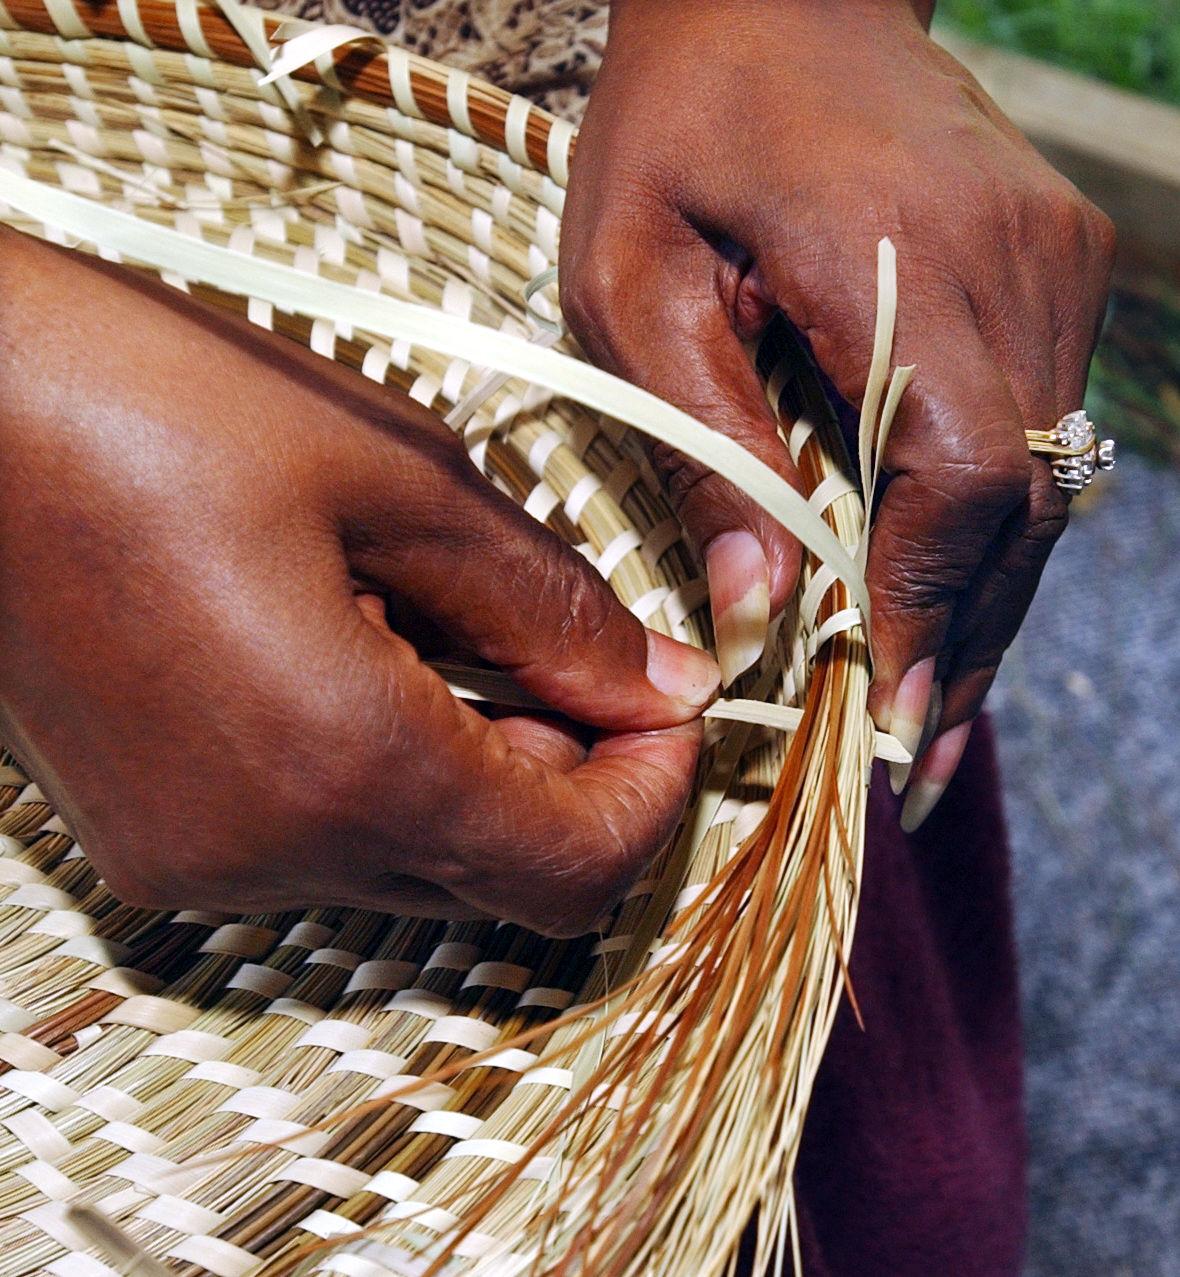 New website targets black tourists, Gullah community